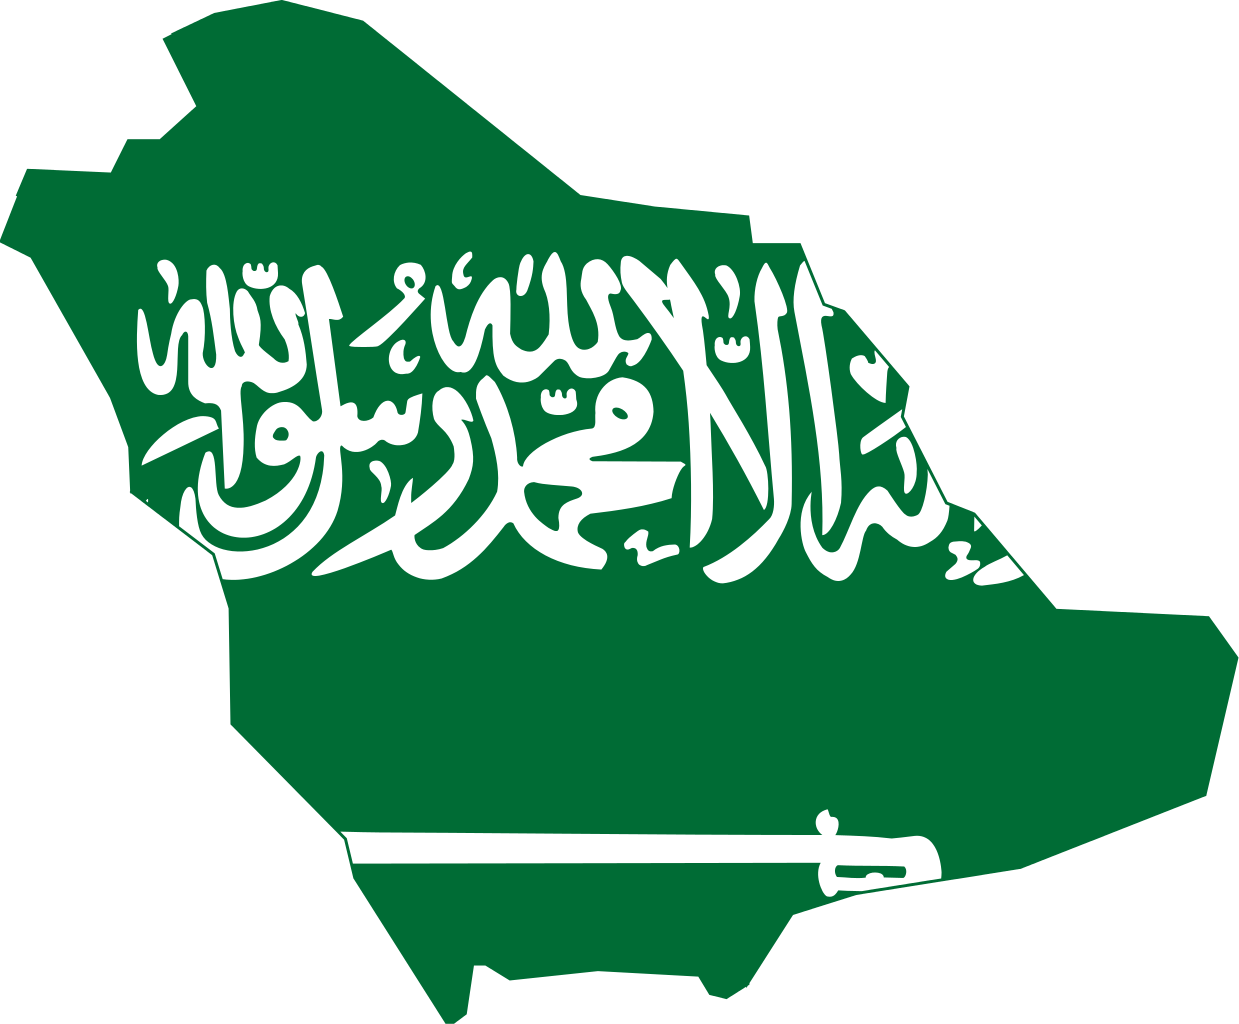 Arabia clipart #7, Download drawings